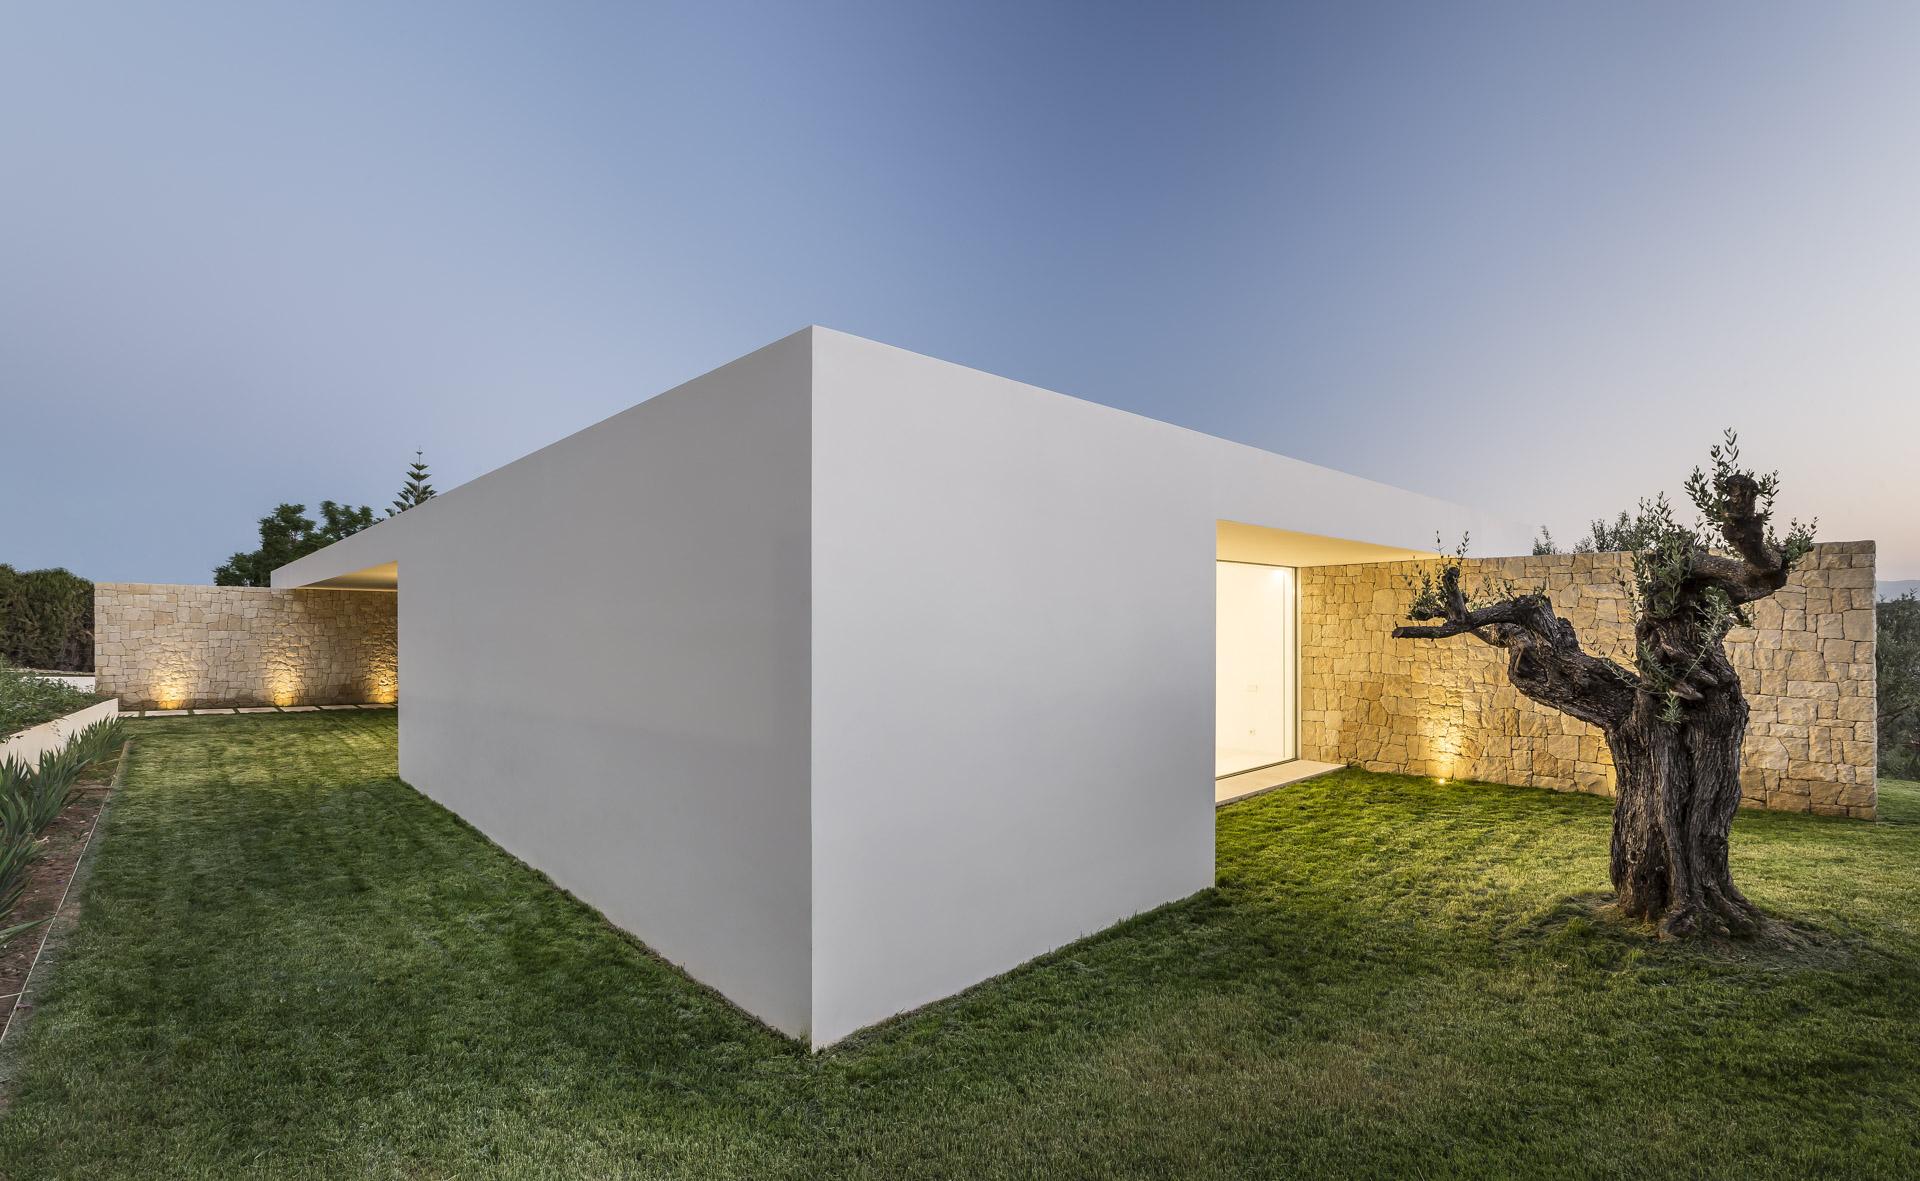 fotografia-arquitectura-valencia-german-cabo-gallardo-llopis-villamarchante-vivienda-57